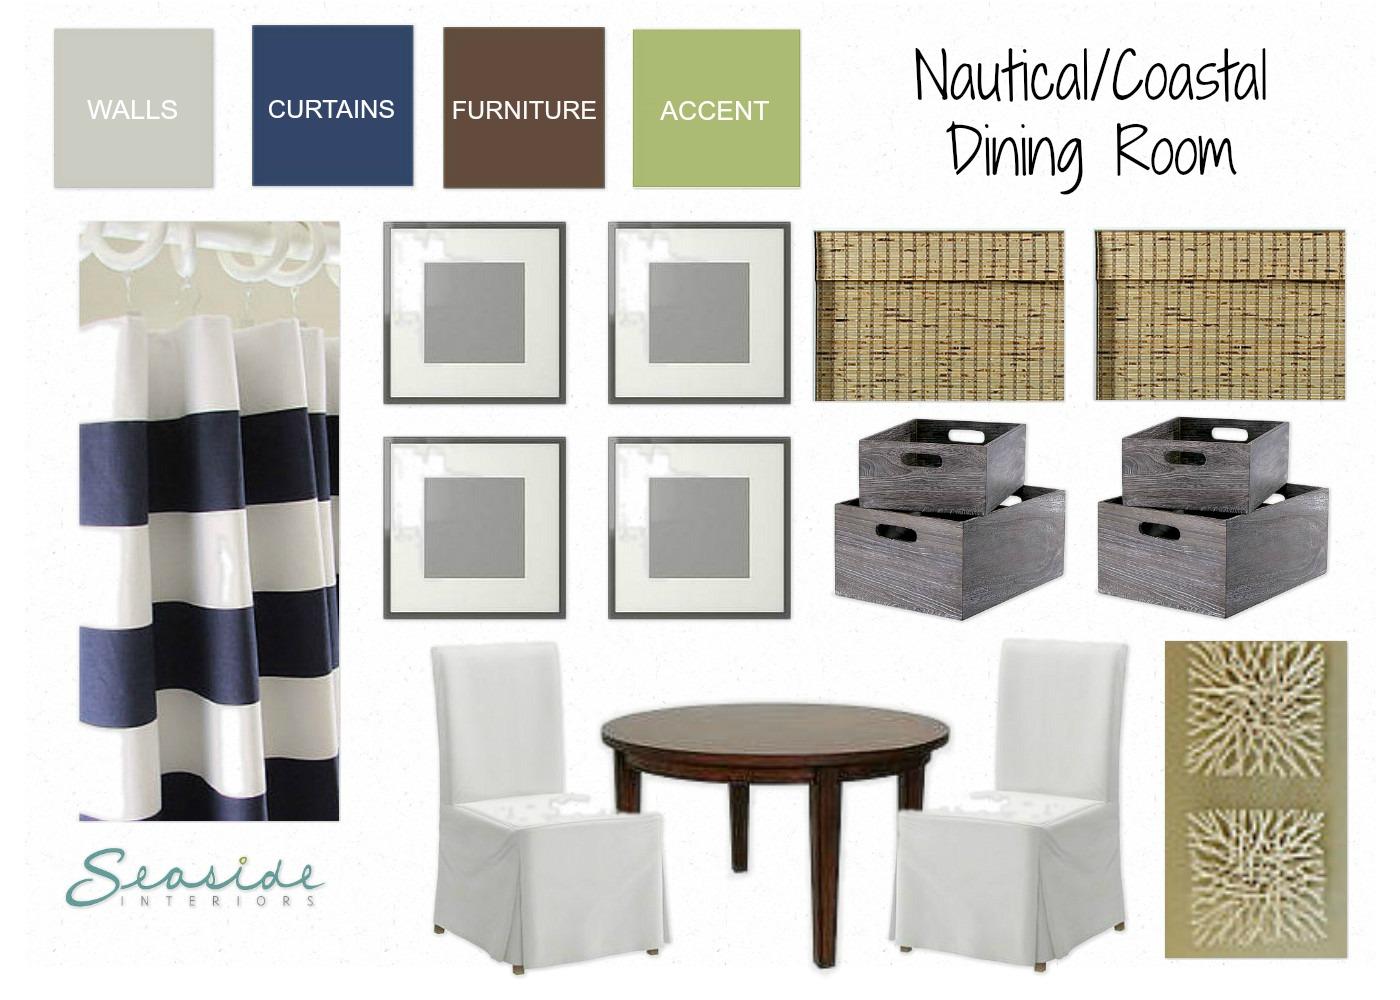 Seaside Interiors: Nautical/Coastal Dining Room Design